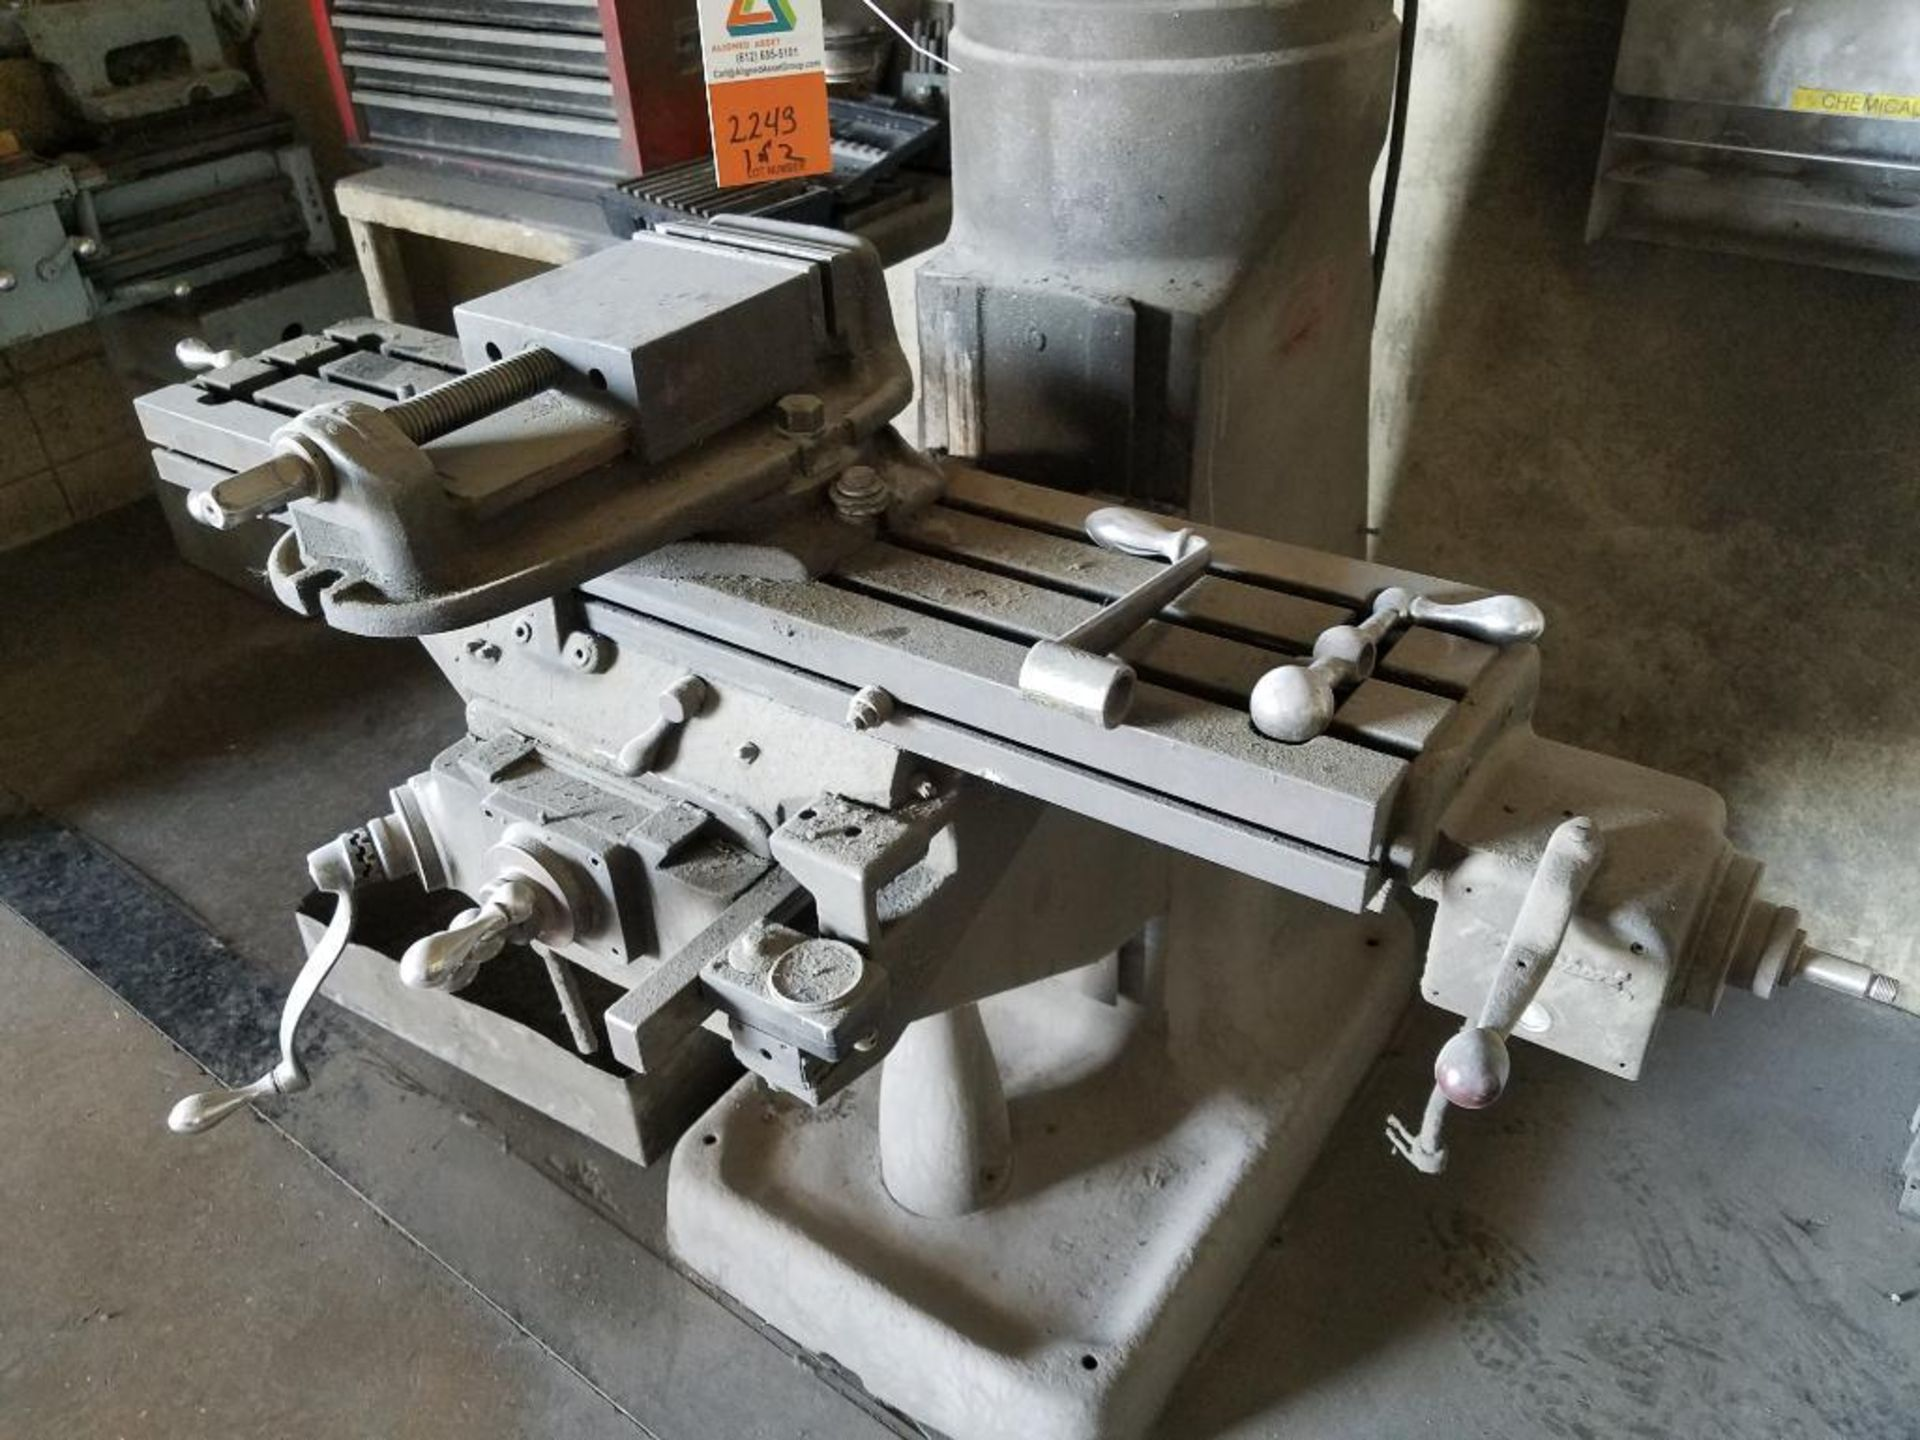 Bridgeport manual mill - Image 2 of 8